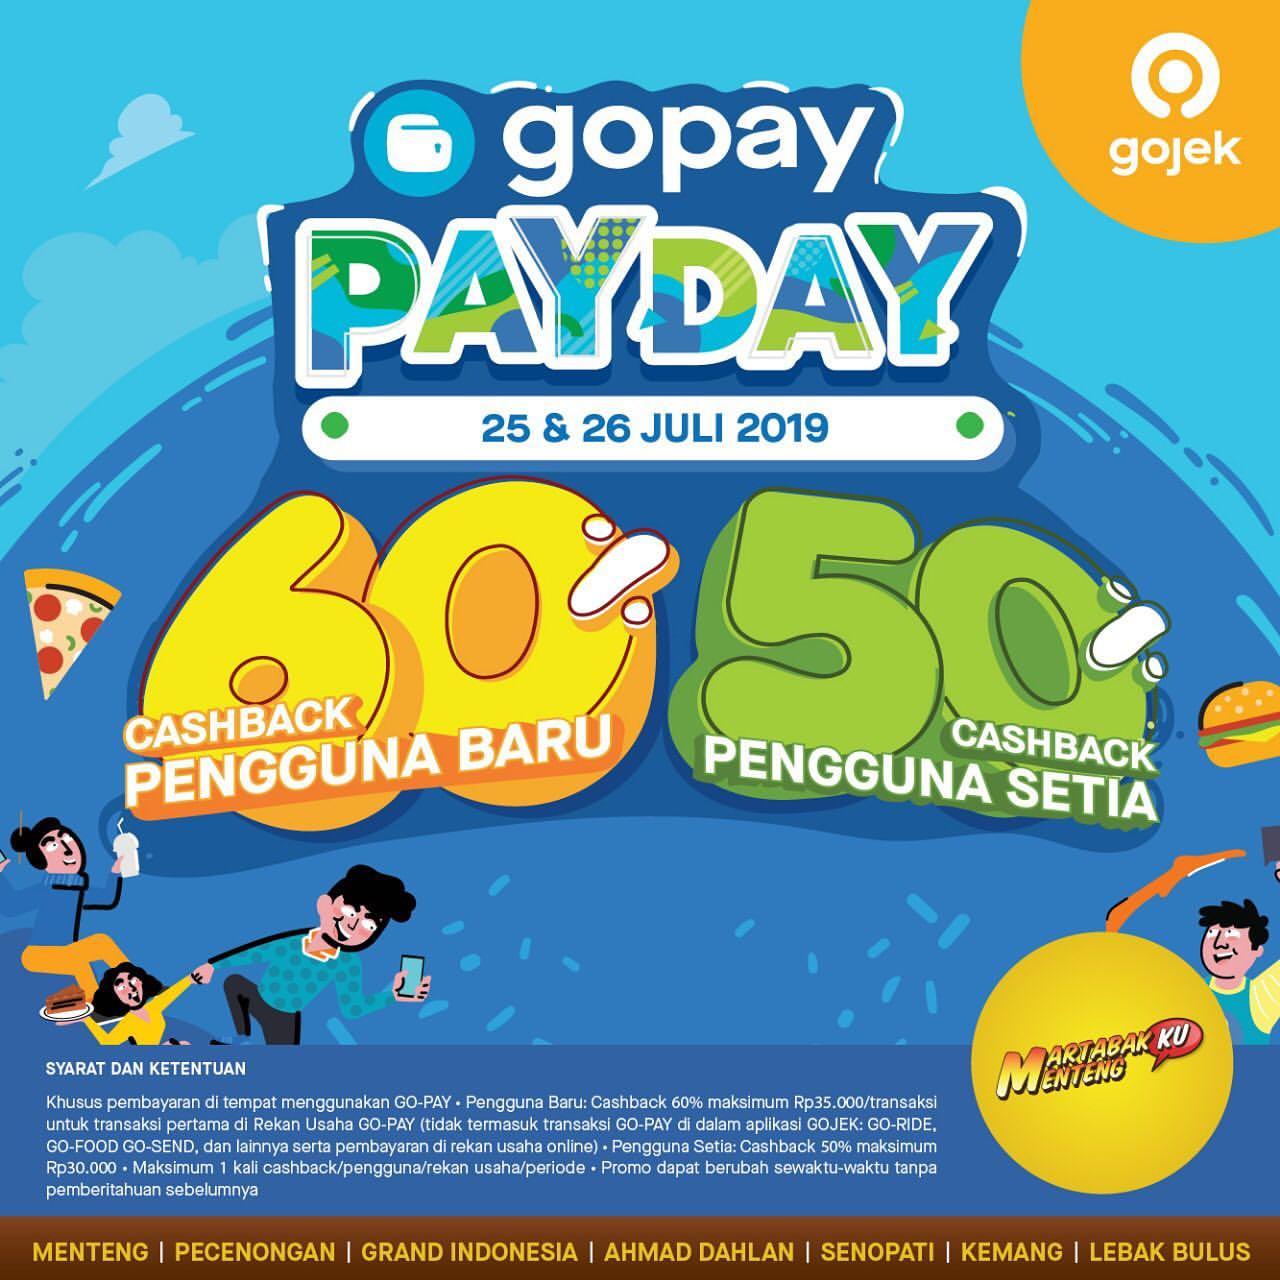 Martabakku Menteng Promo GOPAY PAYDAY, Cashback up to 60%!